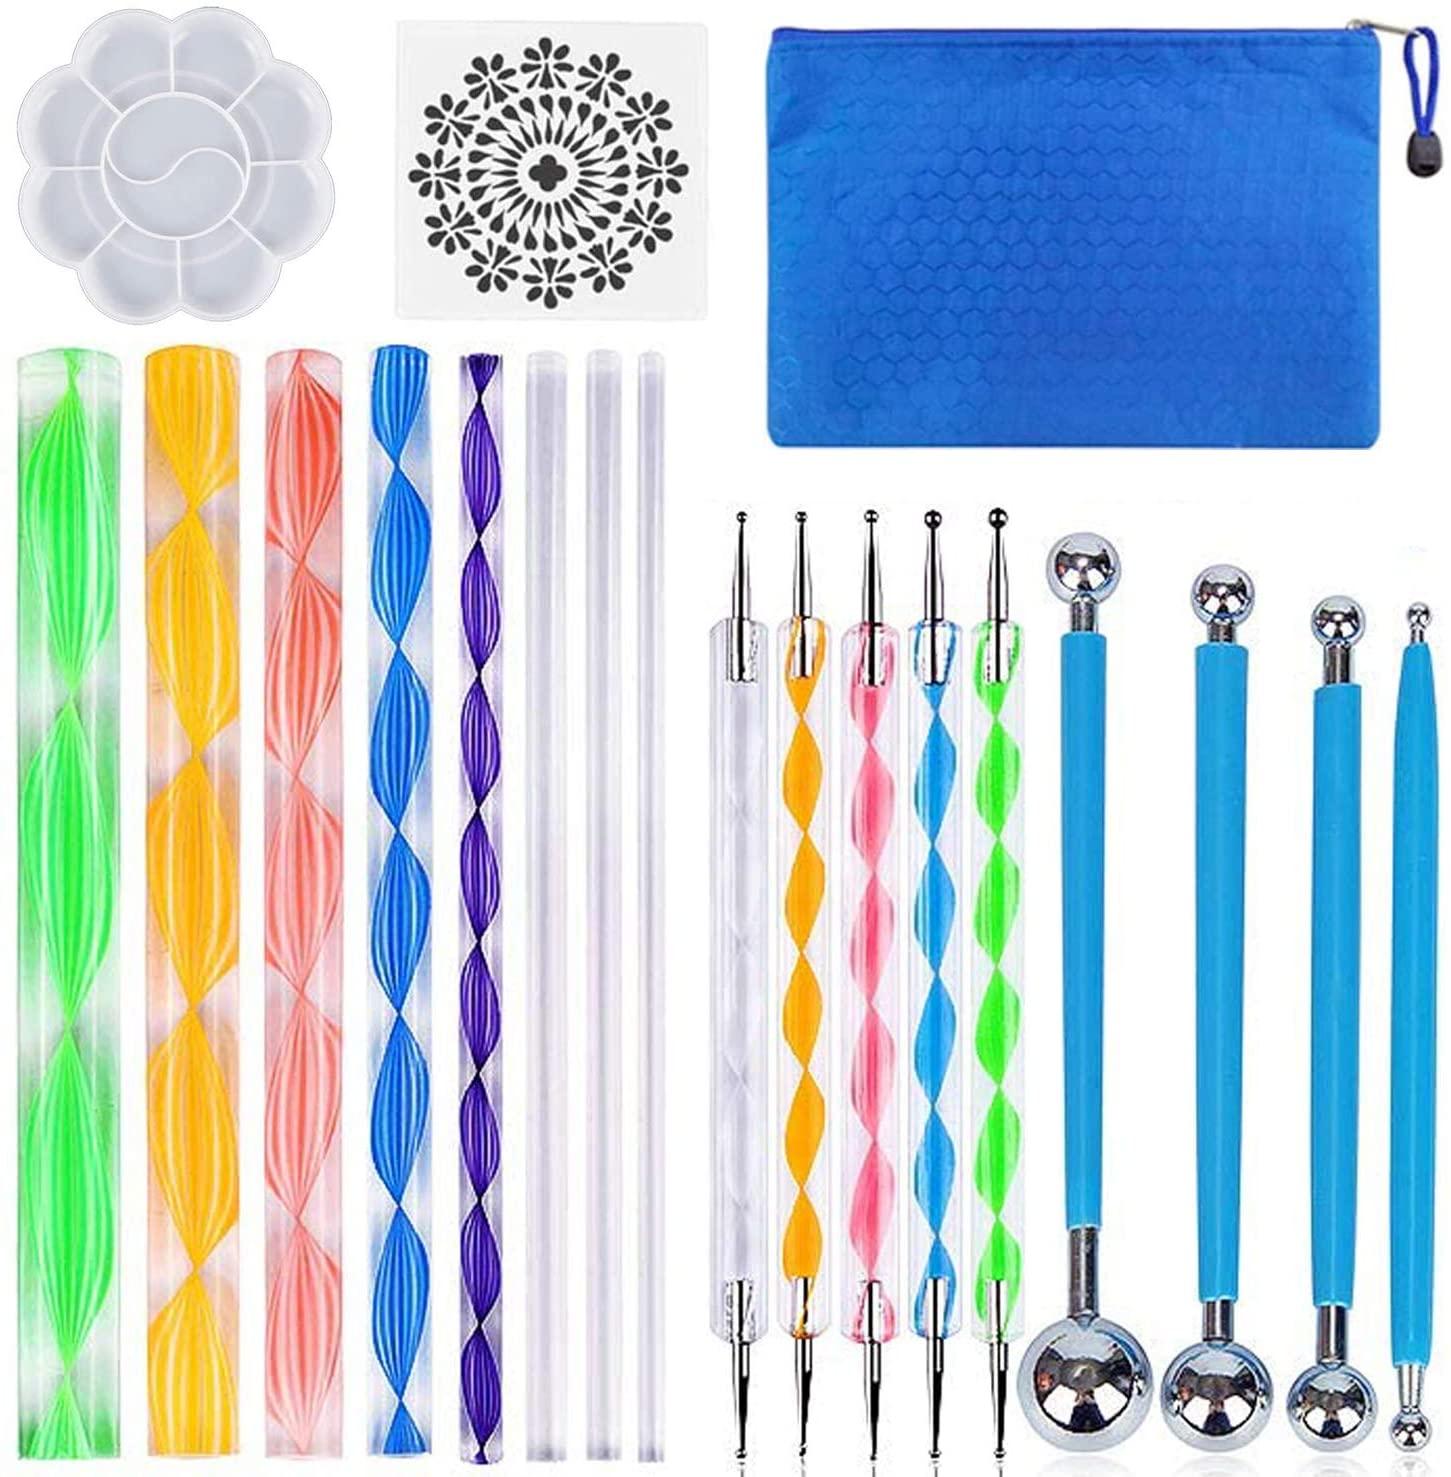 19PCS Mandala Dotting Tools Set with a Zipper Storage Bag for Painting Rocks, ABenkle Mandala Stencil Ball Stylus Paint Tray Set